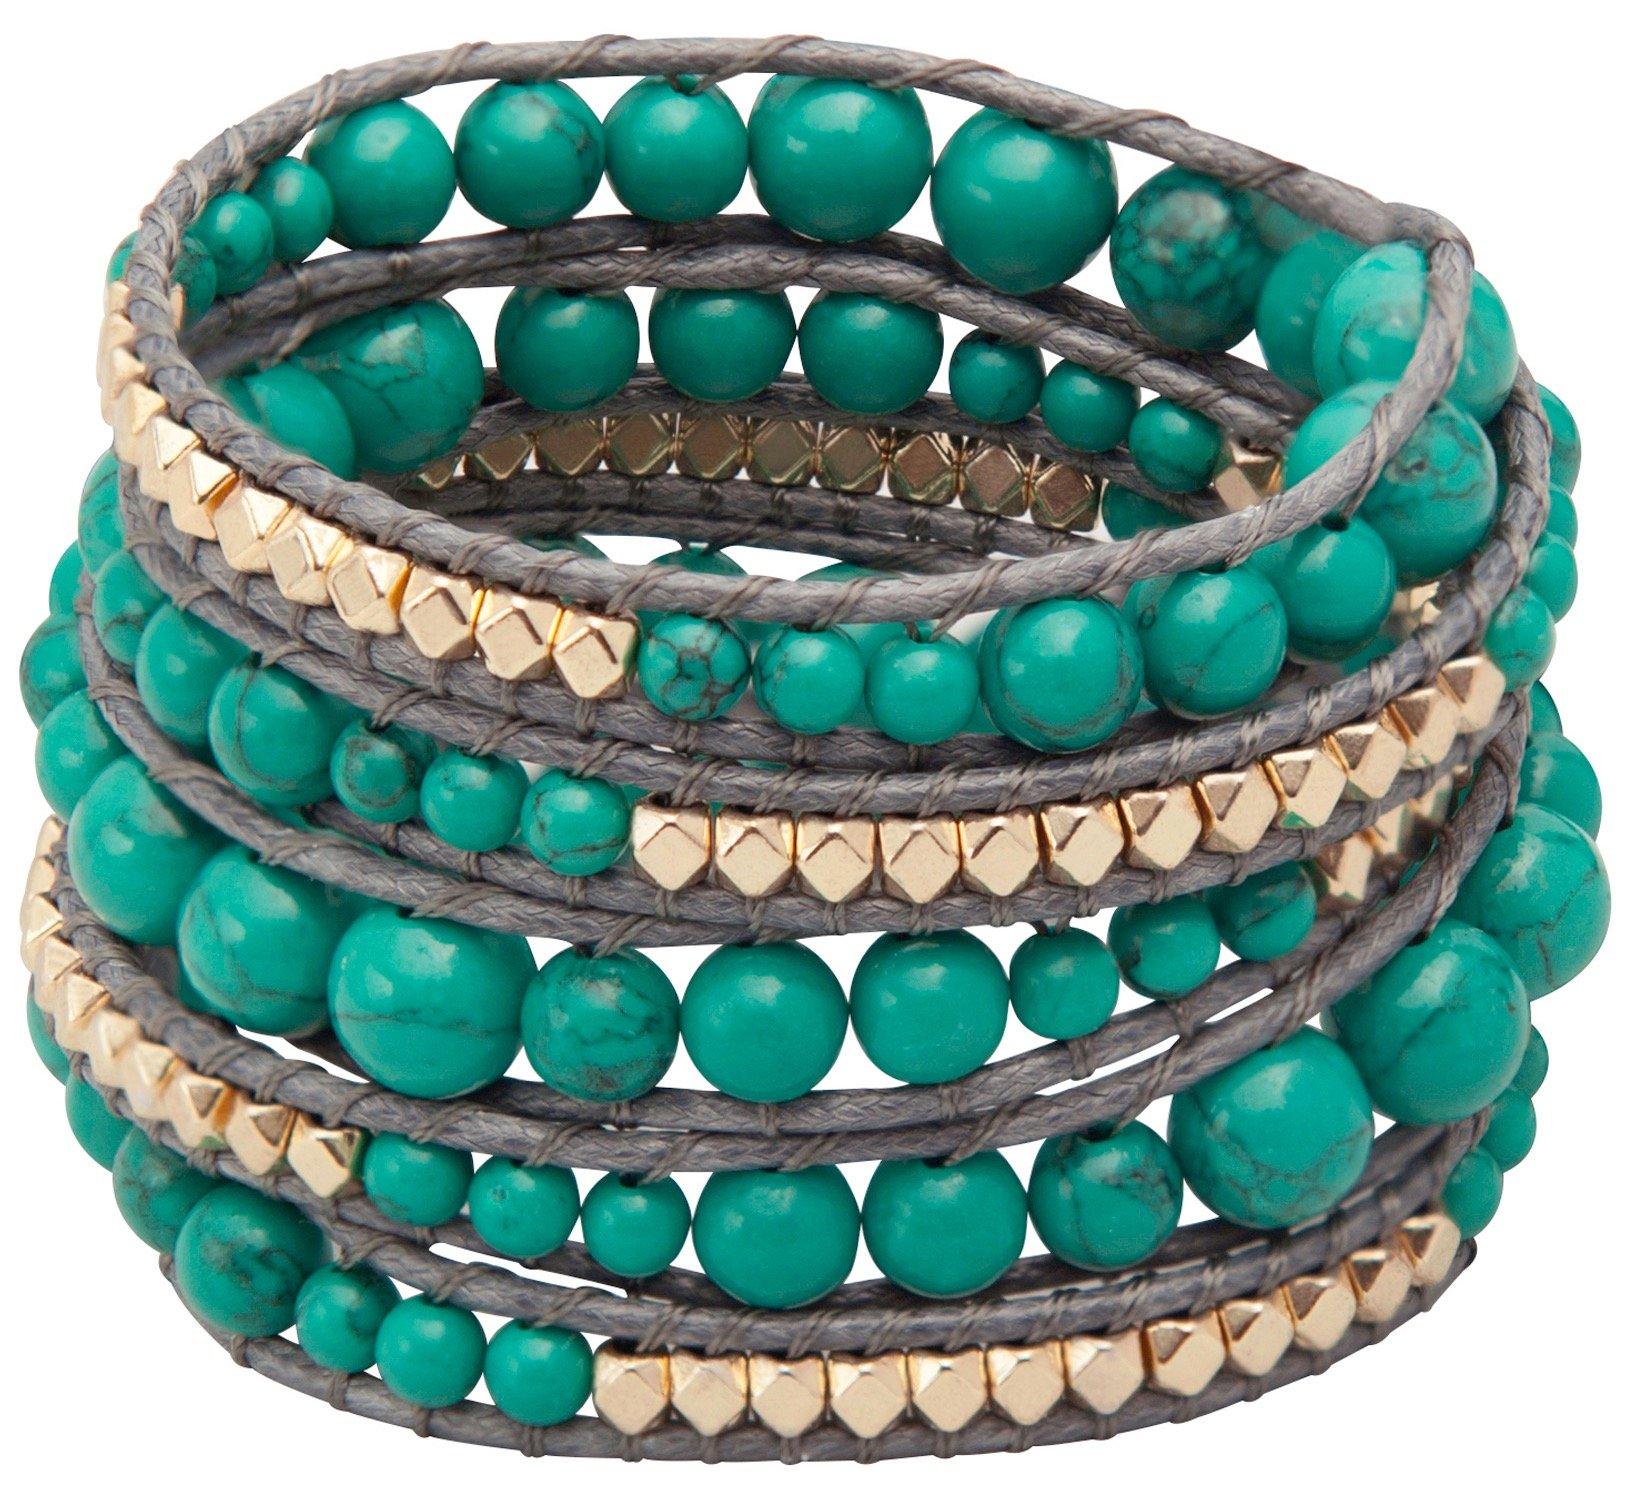 Genuine Stones 5 Wrap Bracelet - Bangle Cuff Rope With Beads - Unisex - Free Size Adjustable (Turquoise) by Sun Life Style (Image #4)